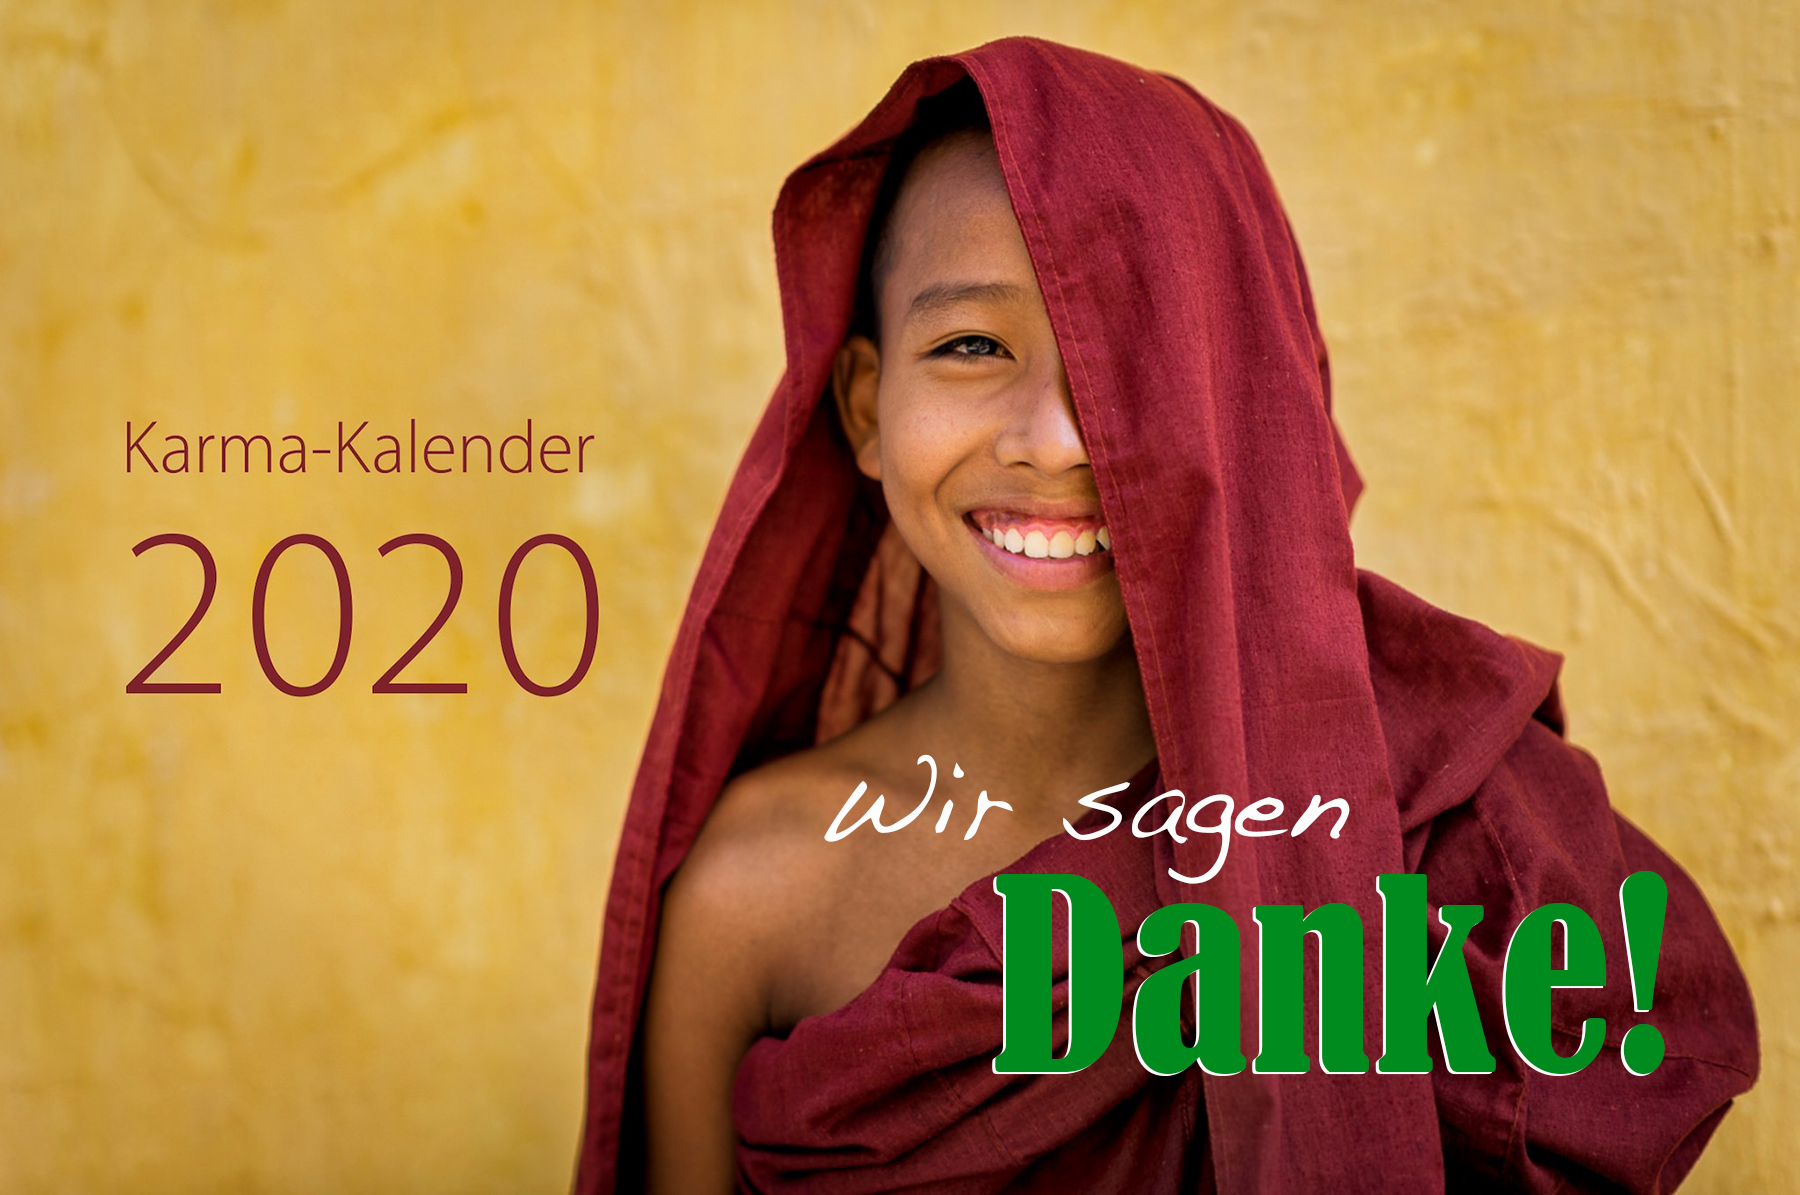 Karma-Kalender 2020 - Wir sagen Danke!